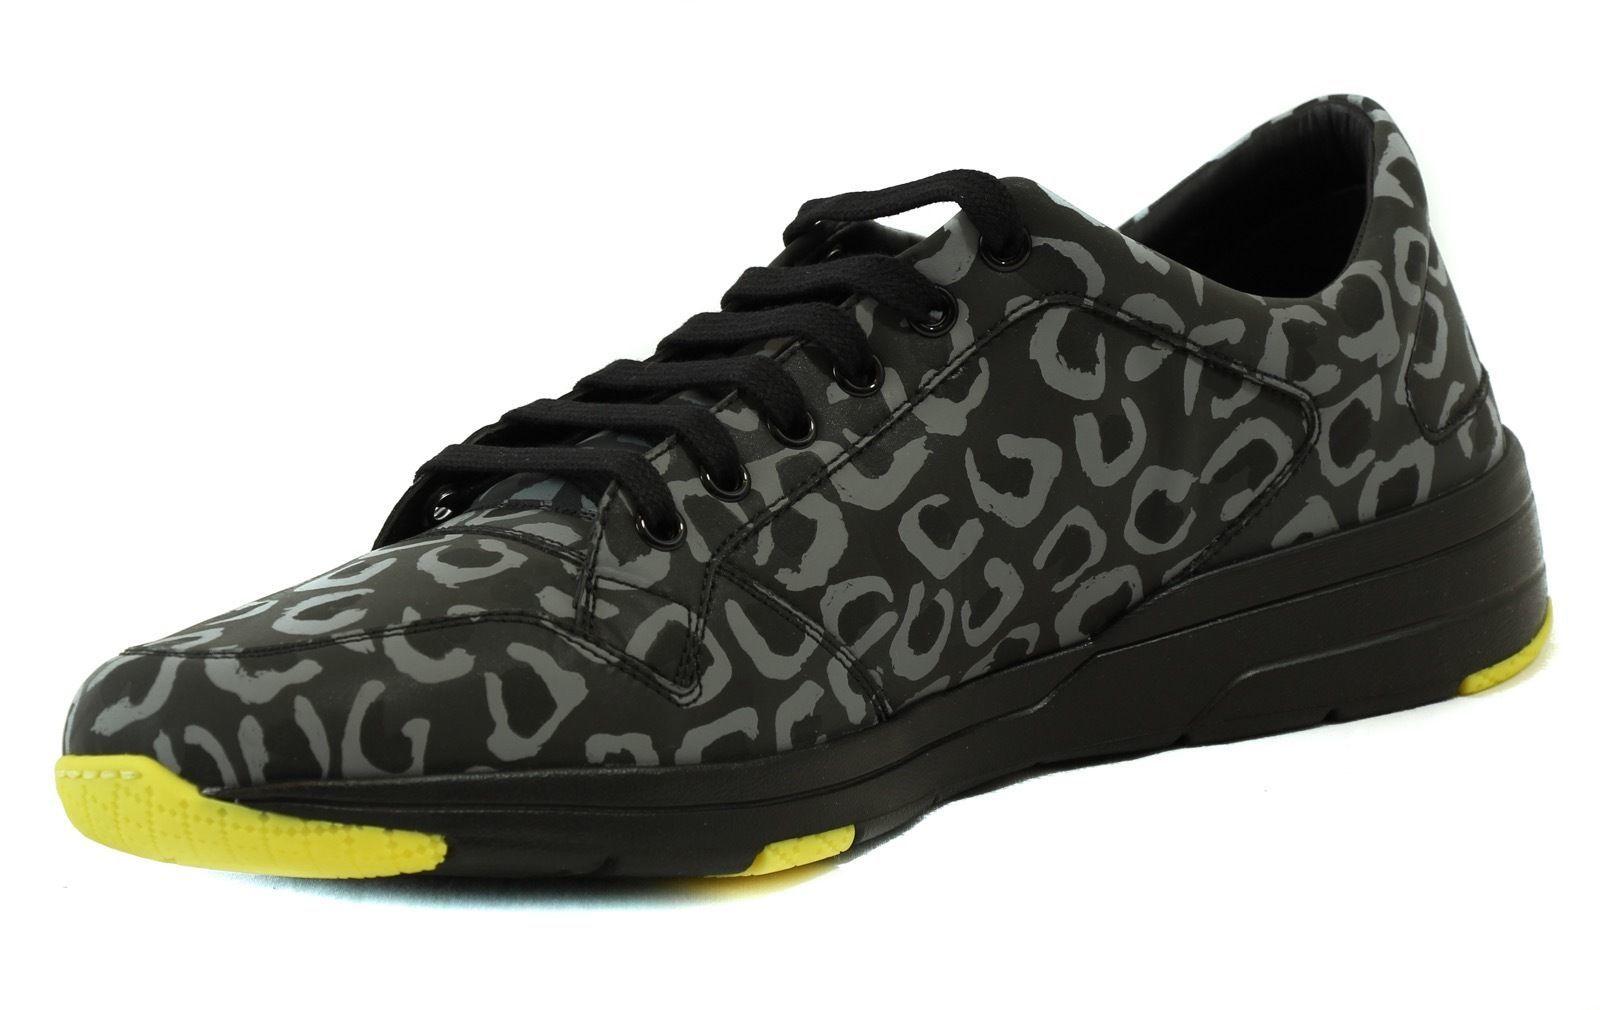 6364dabe775 ... NIB GUCCI 375083 Men s Lace Up Reflex Leopard Print Sneaker Shoes